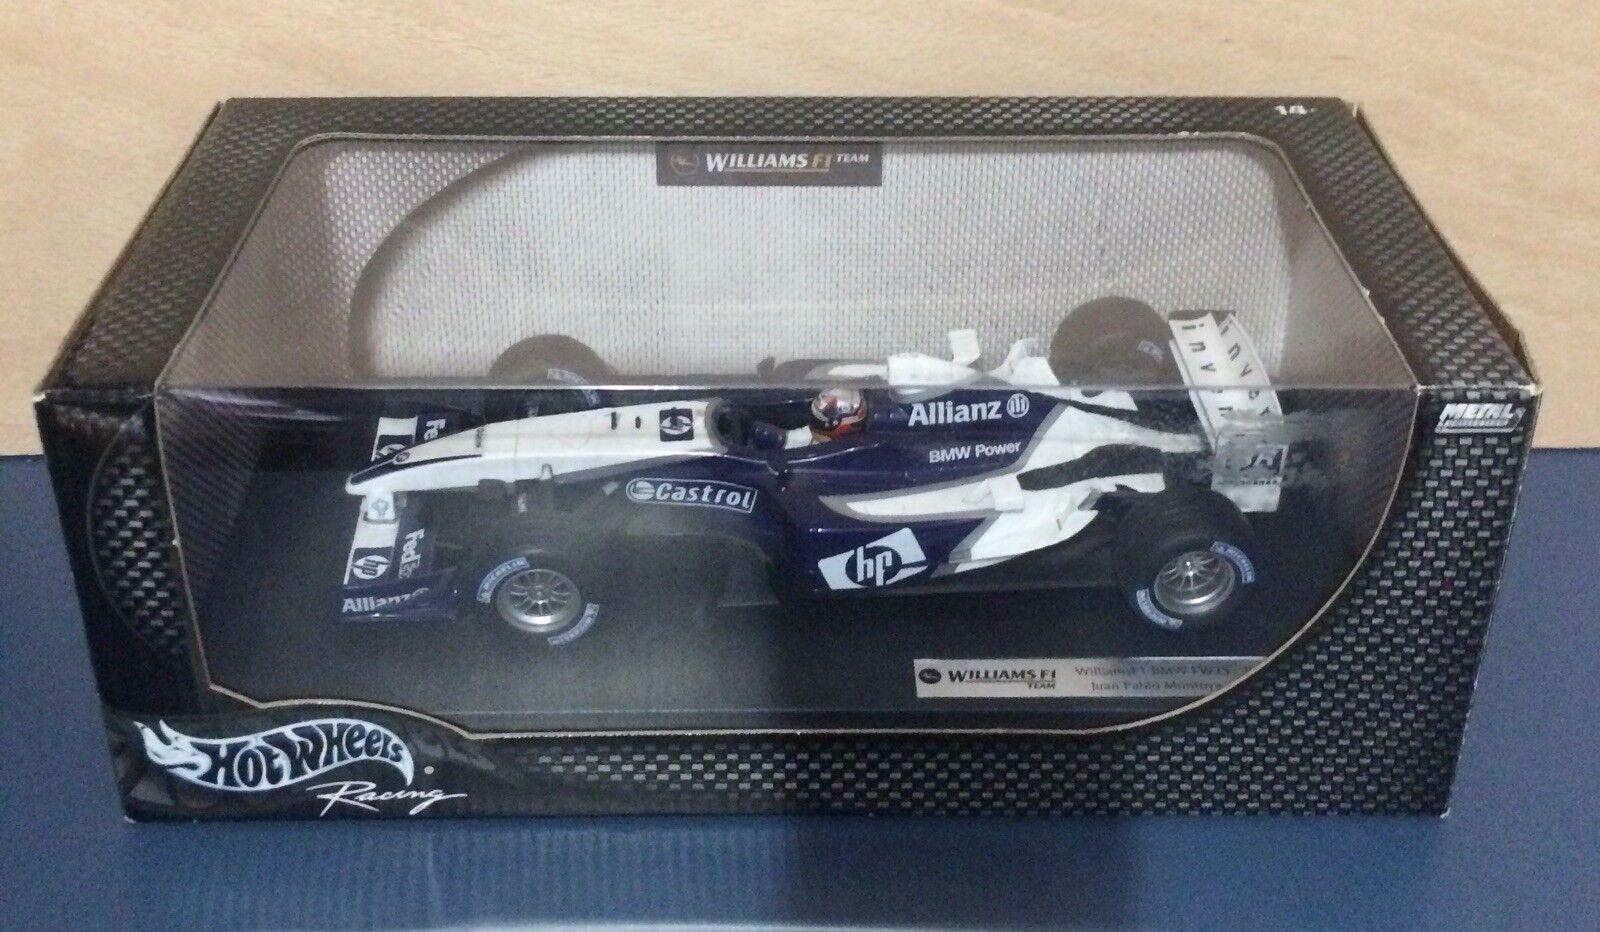 1 18 Hot Wheels F1 WILLIAMS BMW FW25 Juan Pablo MONTOYA 2003 - Formula One 1 18